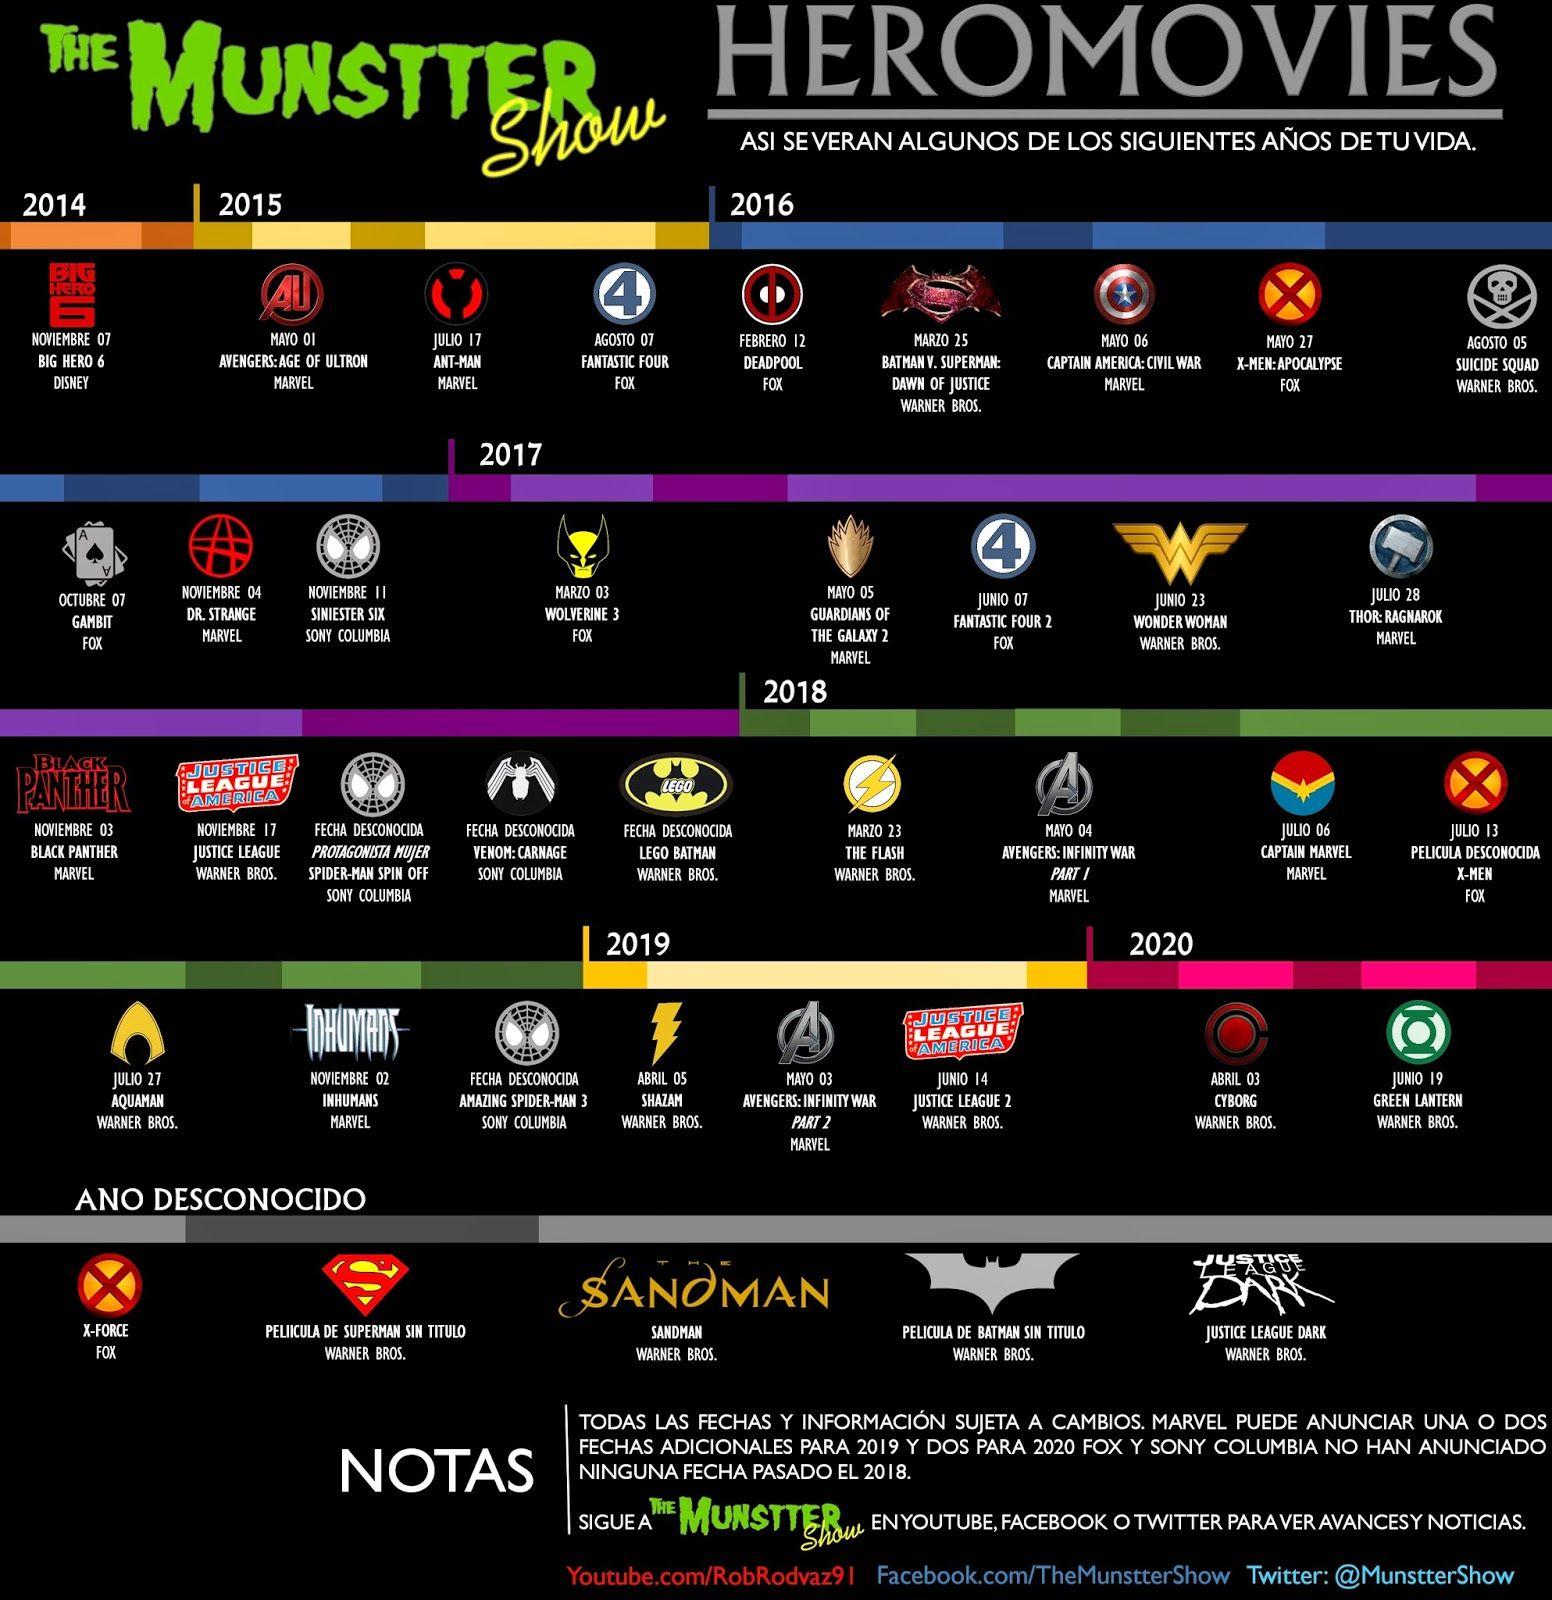 Movie Calendar 2020 Hero Movies Calendar 2014   2020 January 2015 Update | Fandoms